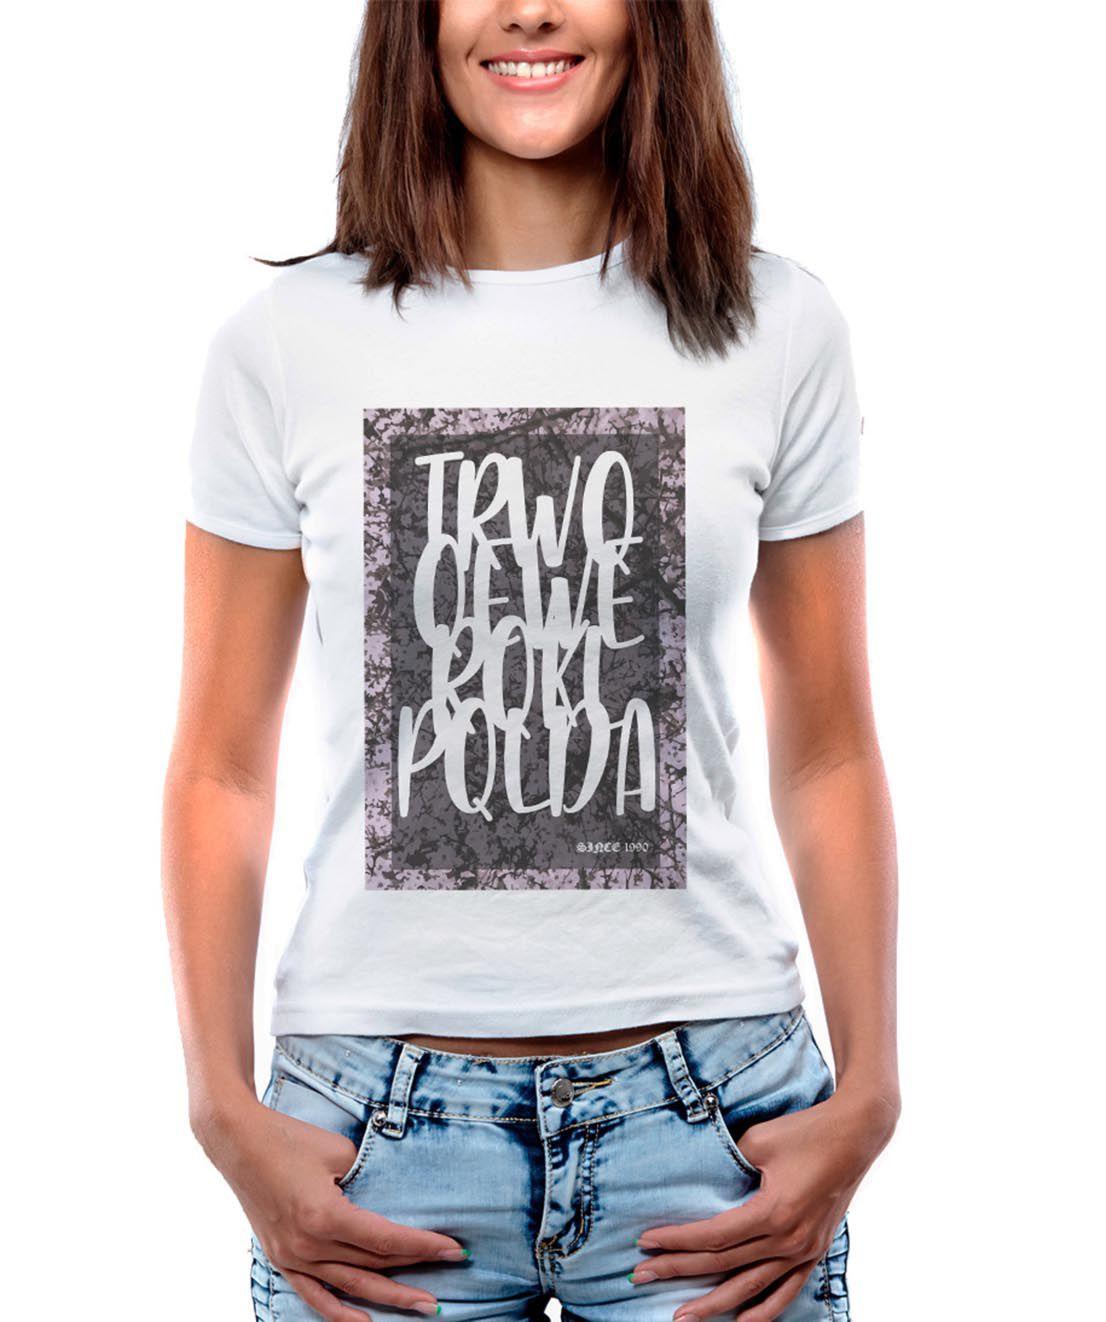 Blusa OutletDri T-Shirt Estampada Handwriting Board Branco